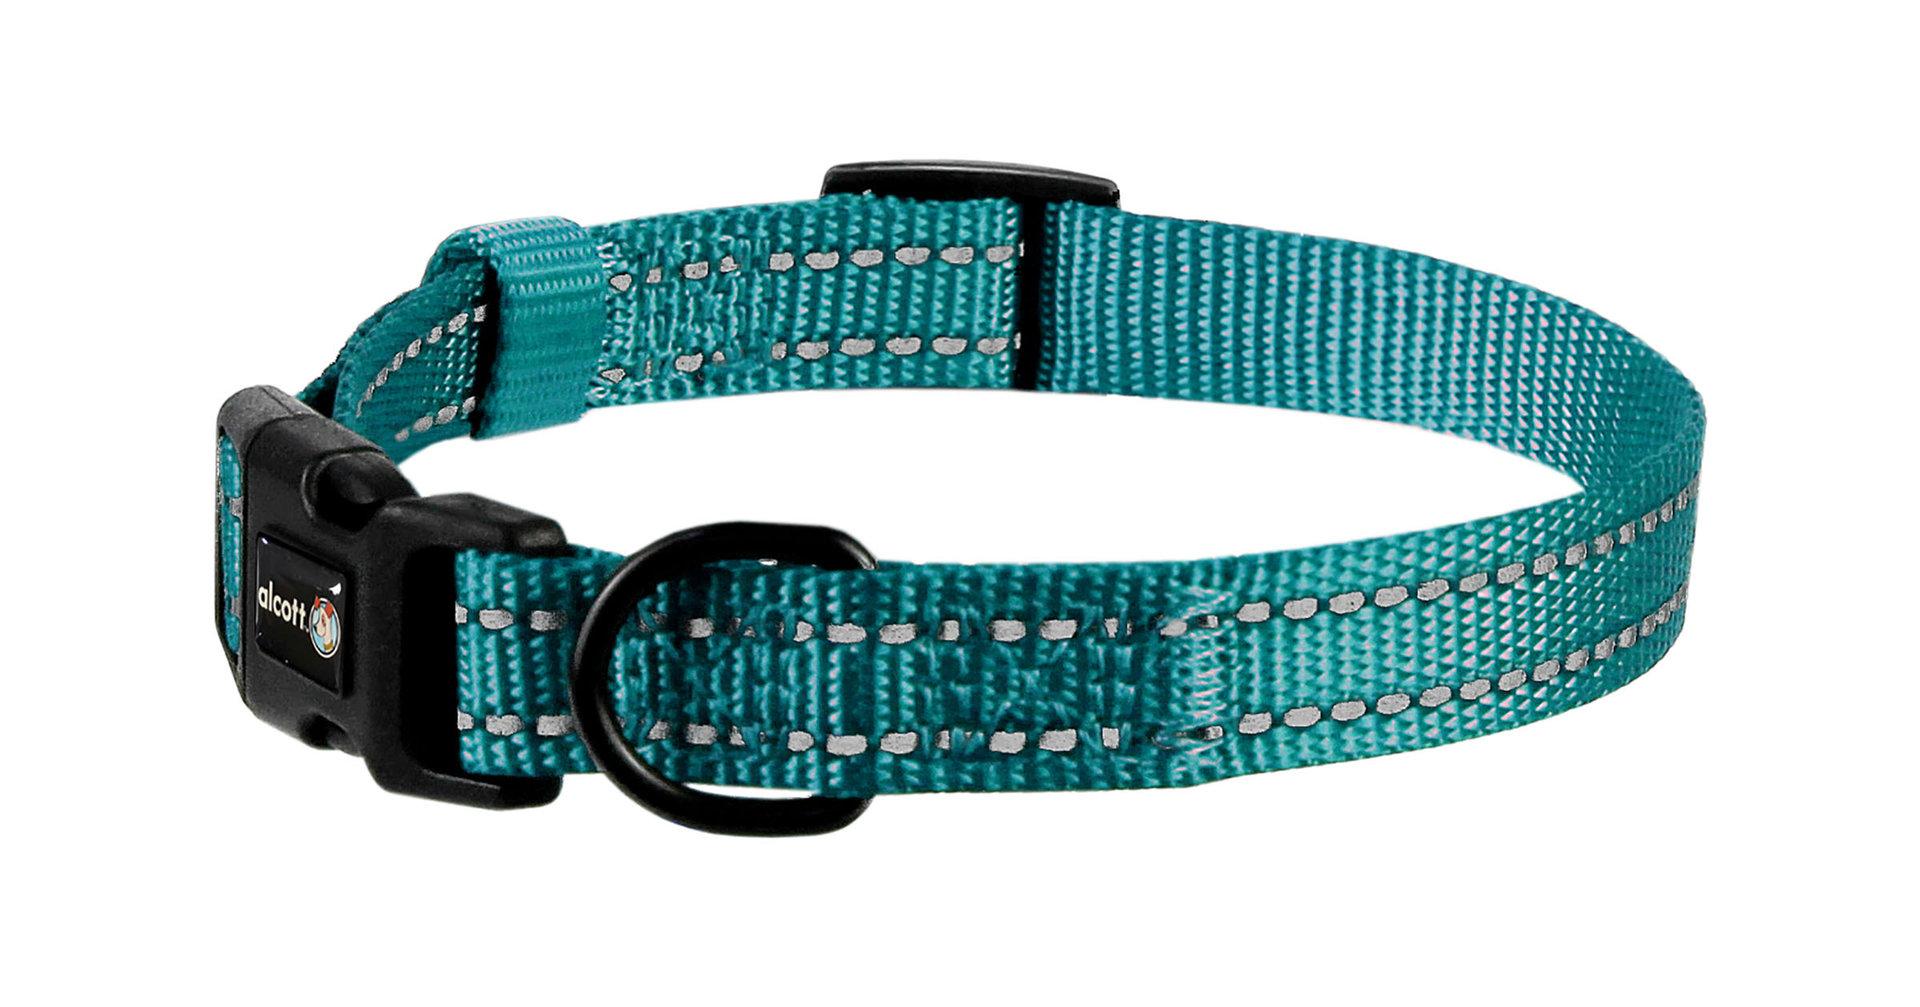 Wanderer Halsband, blau, S - L